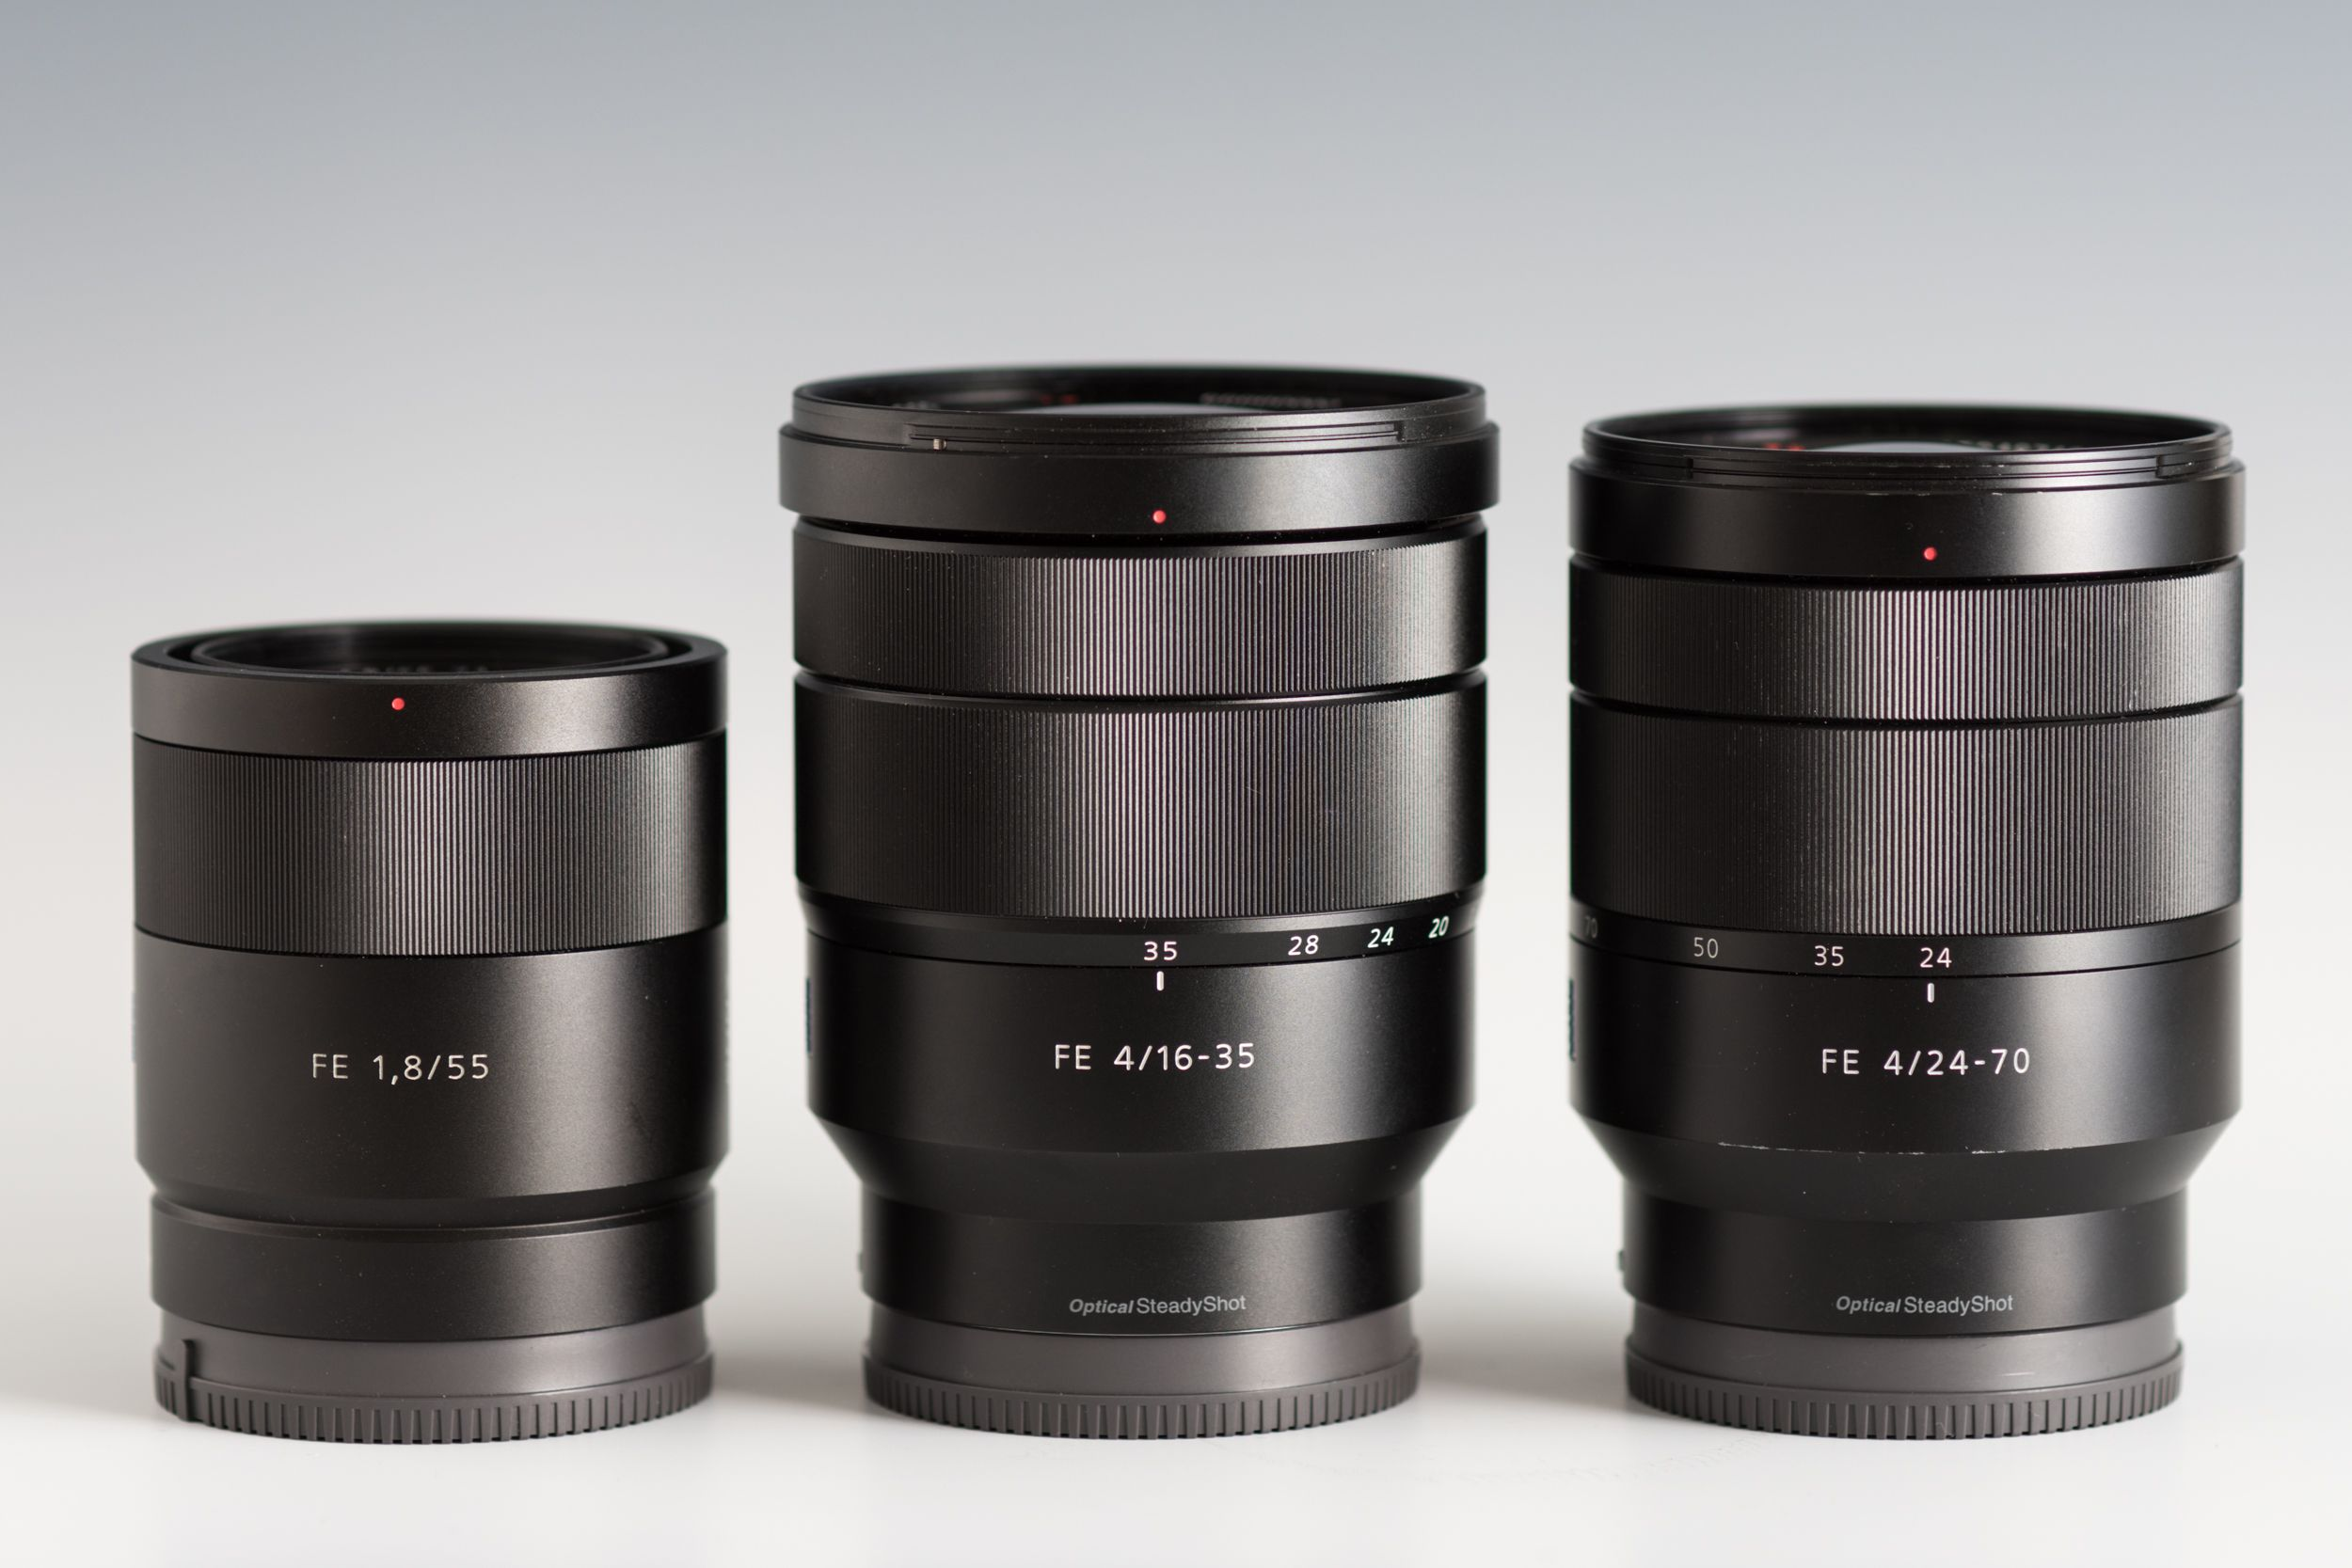 Sony Alpha Fe 16 35 F4 Z Oss Review By Sony Artisan Brian Matiash Sony Sony Camera Alpha Sony Alpha